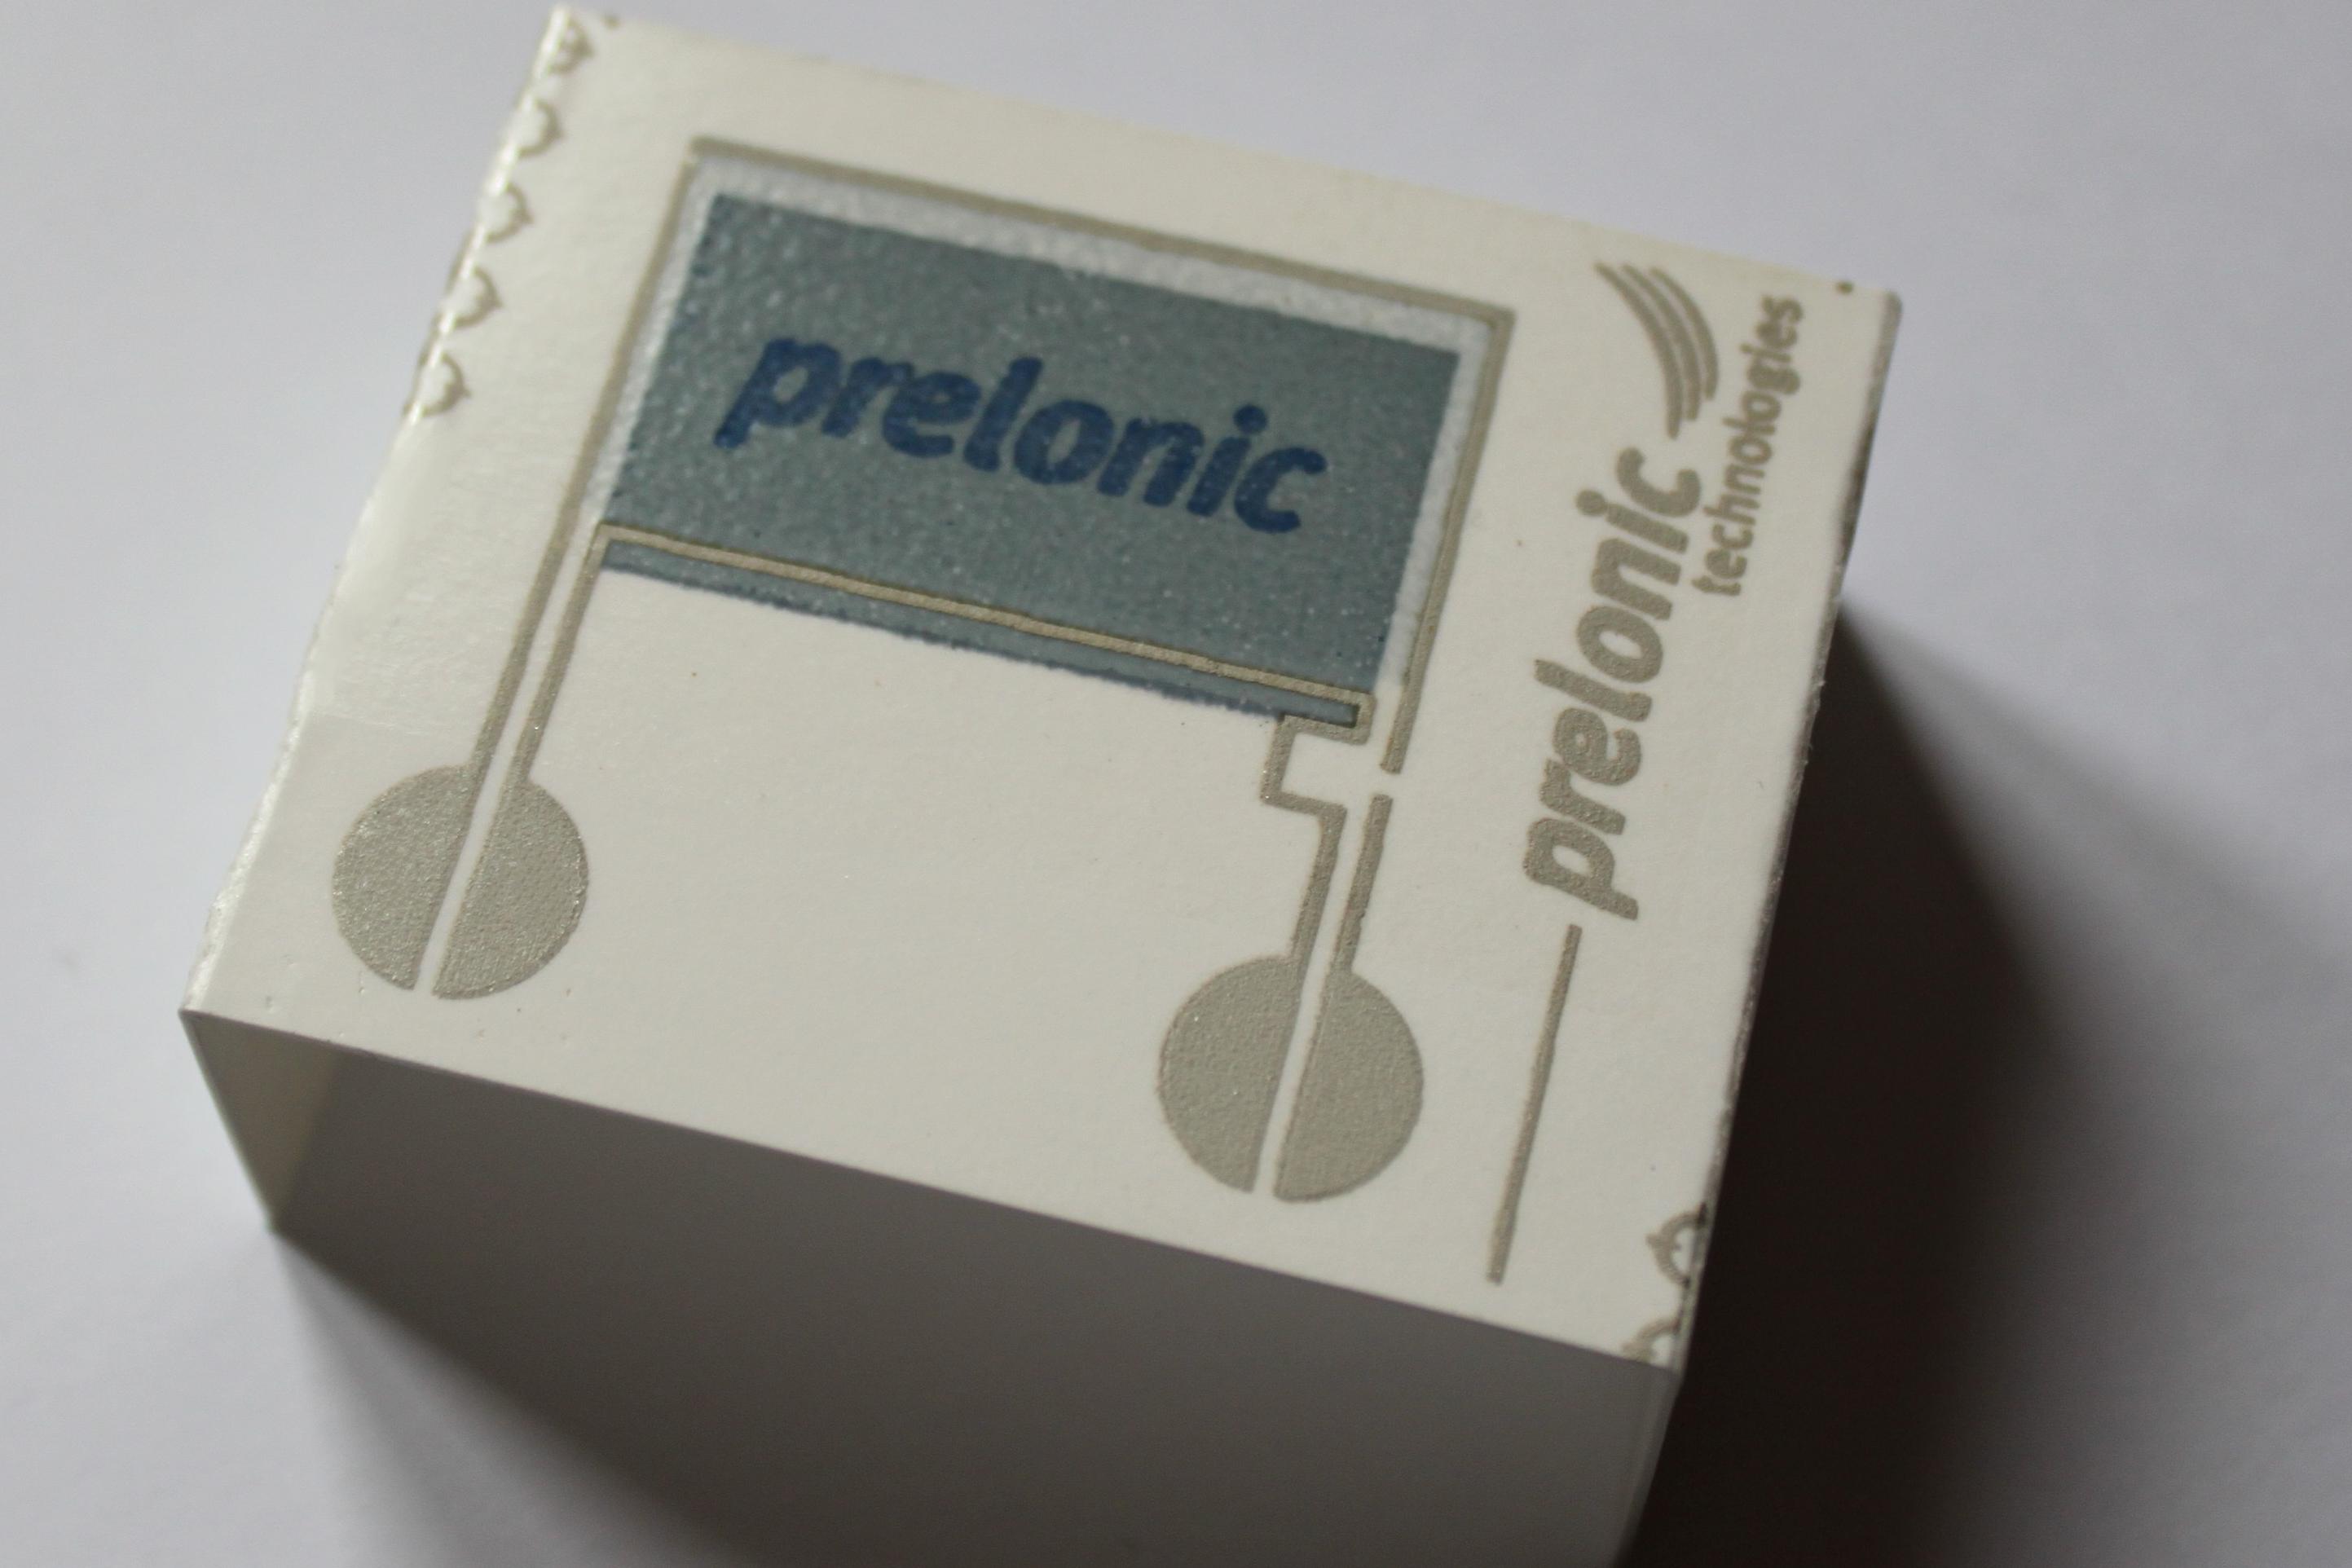 Prelonic cardboard display